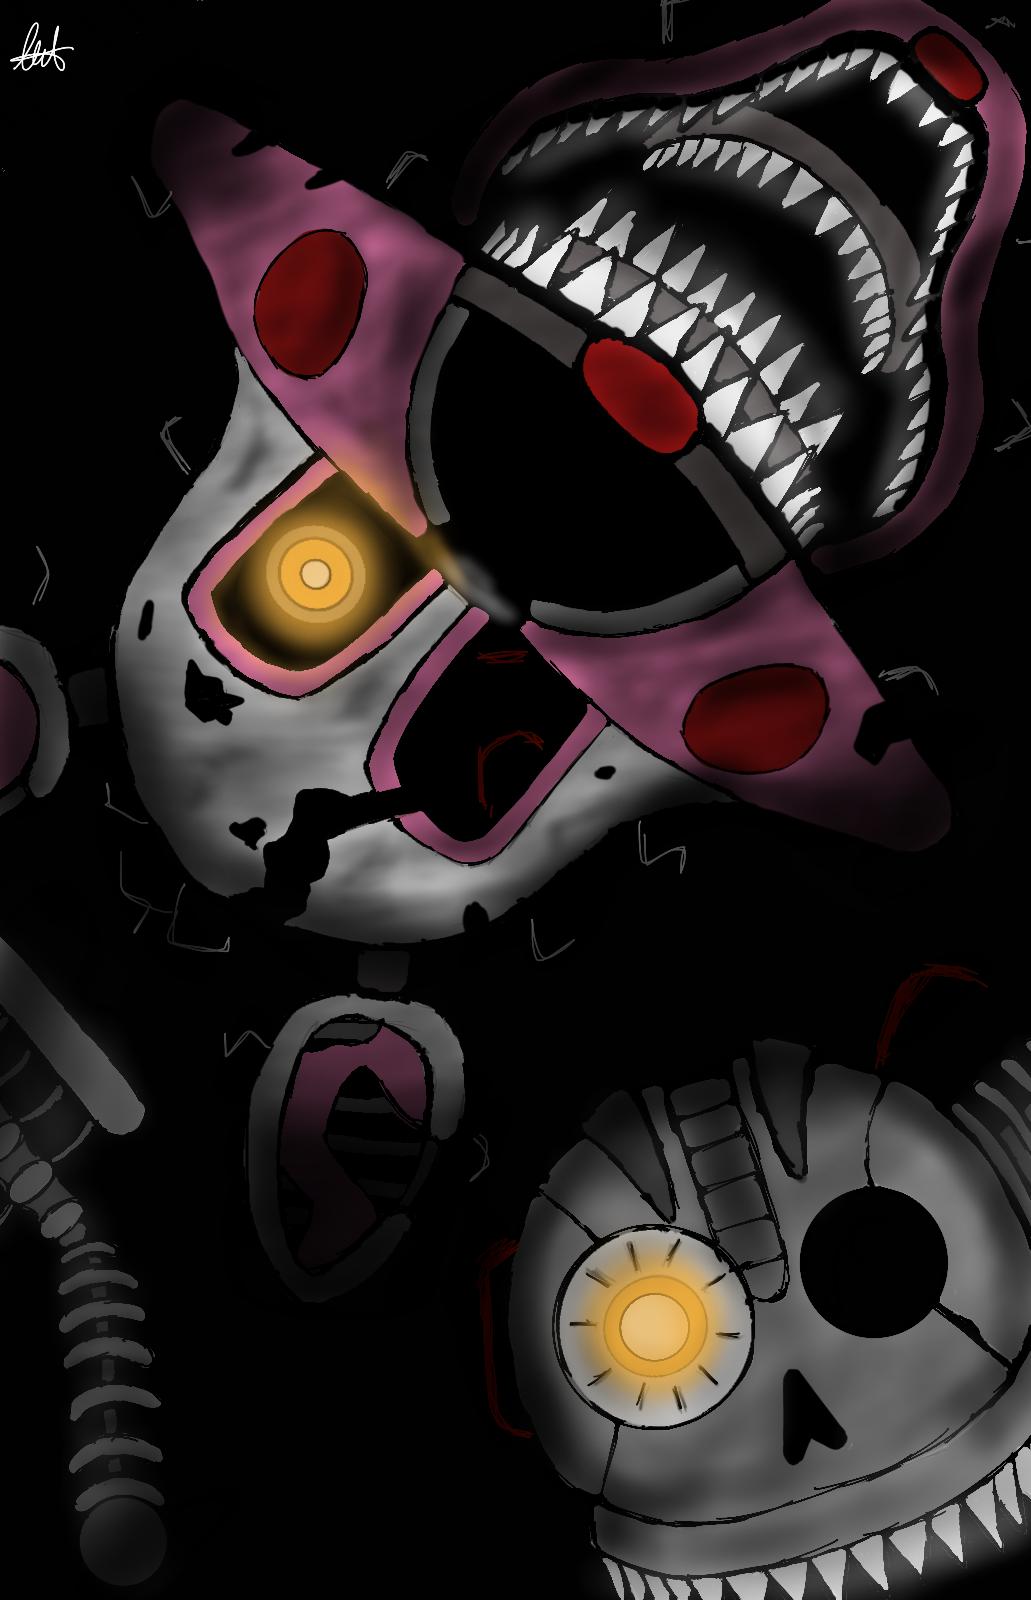 fnaf 4 mangle nightmare - photo #28